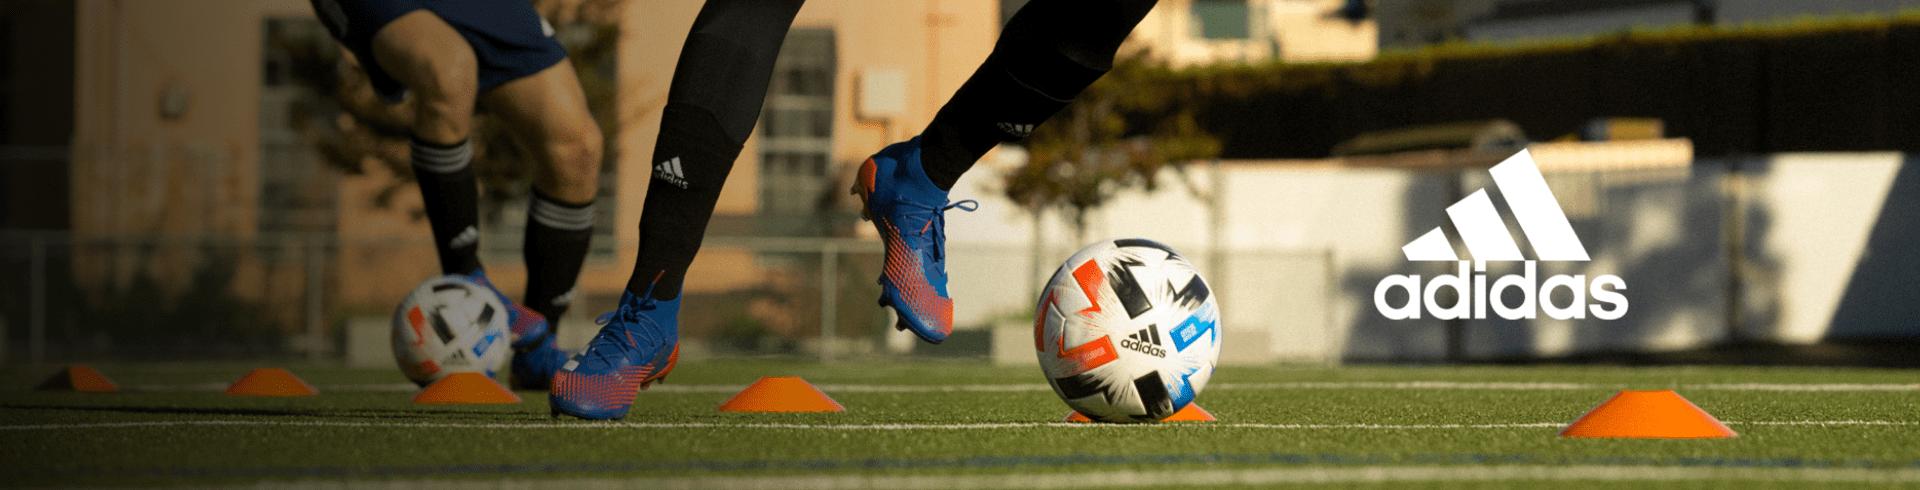 Merchandising calcio Adidas | Official Store | GoalShop.it